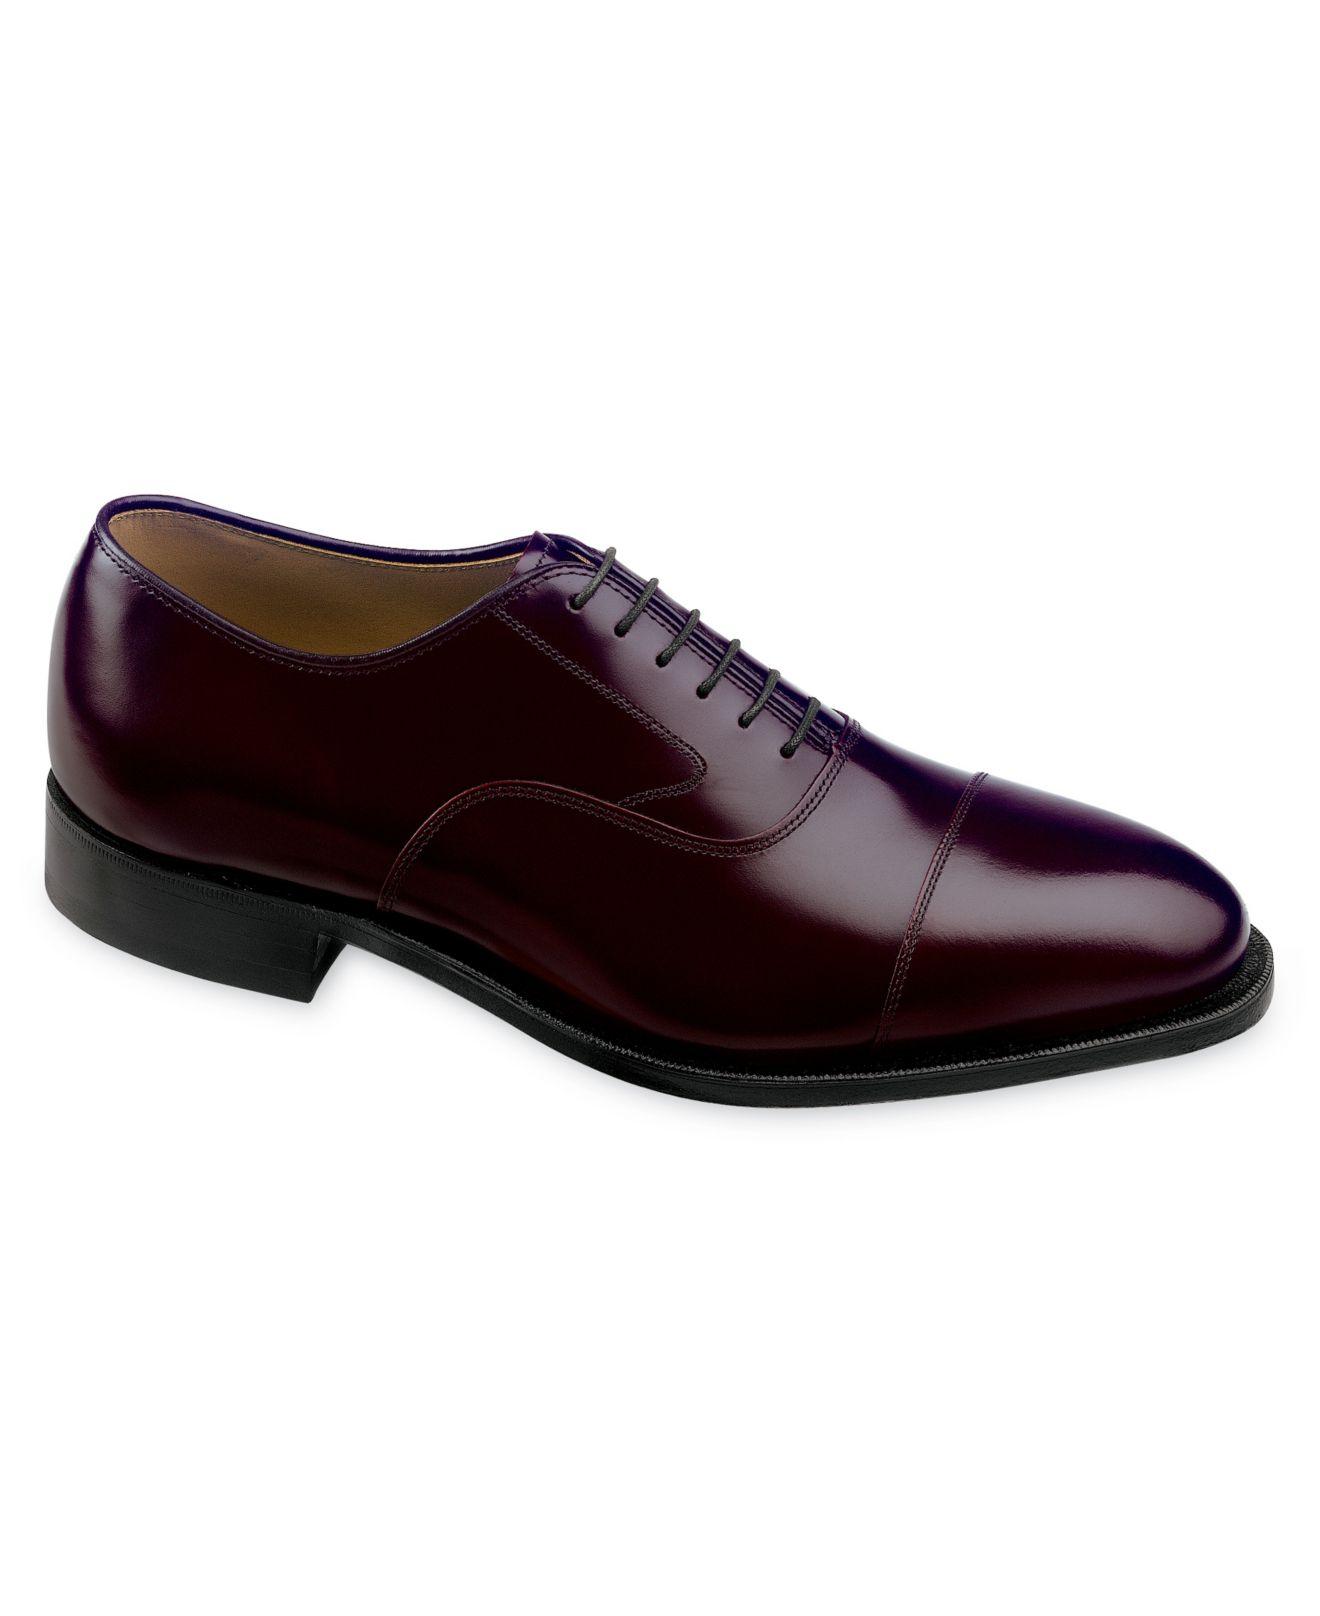 Johnston Amp Murphy Shoes Melton Cap Toe Oxfords In Purple